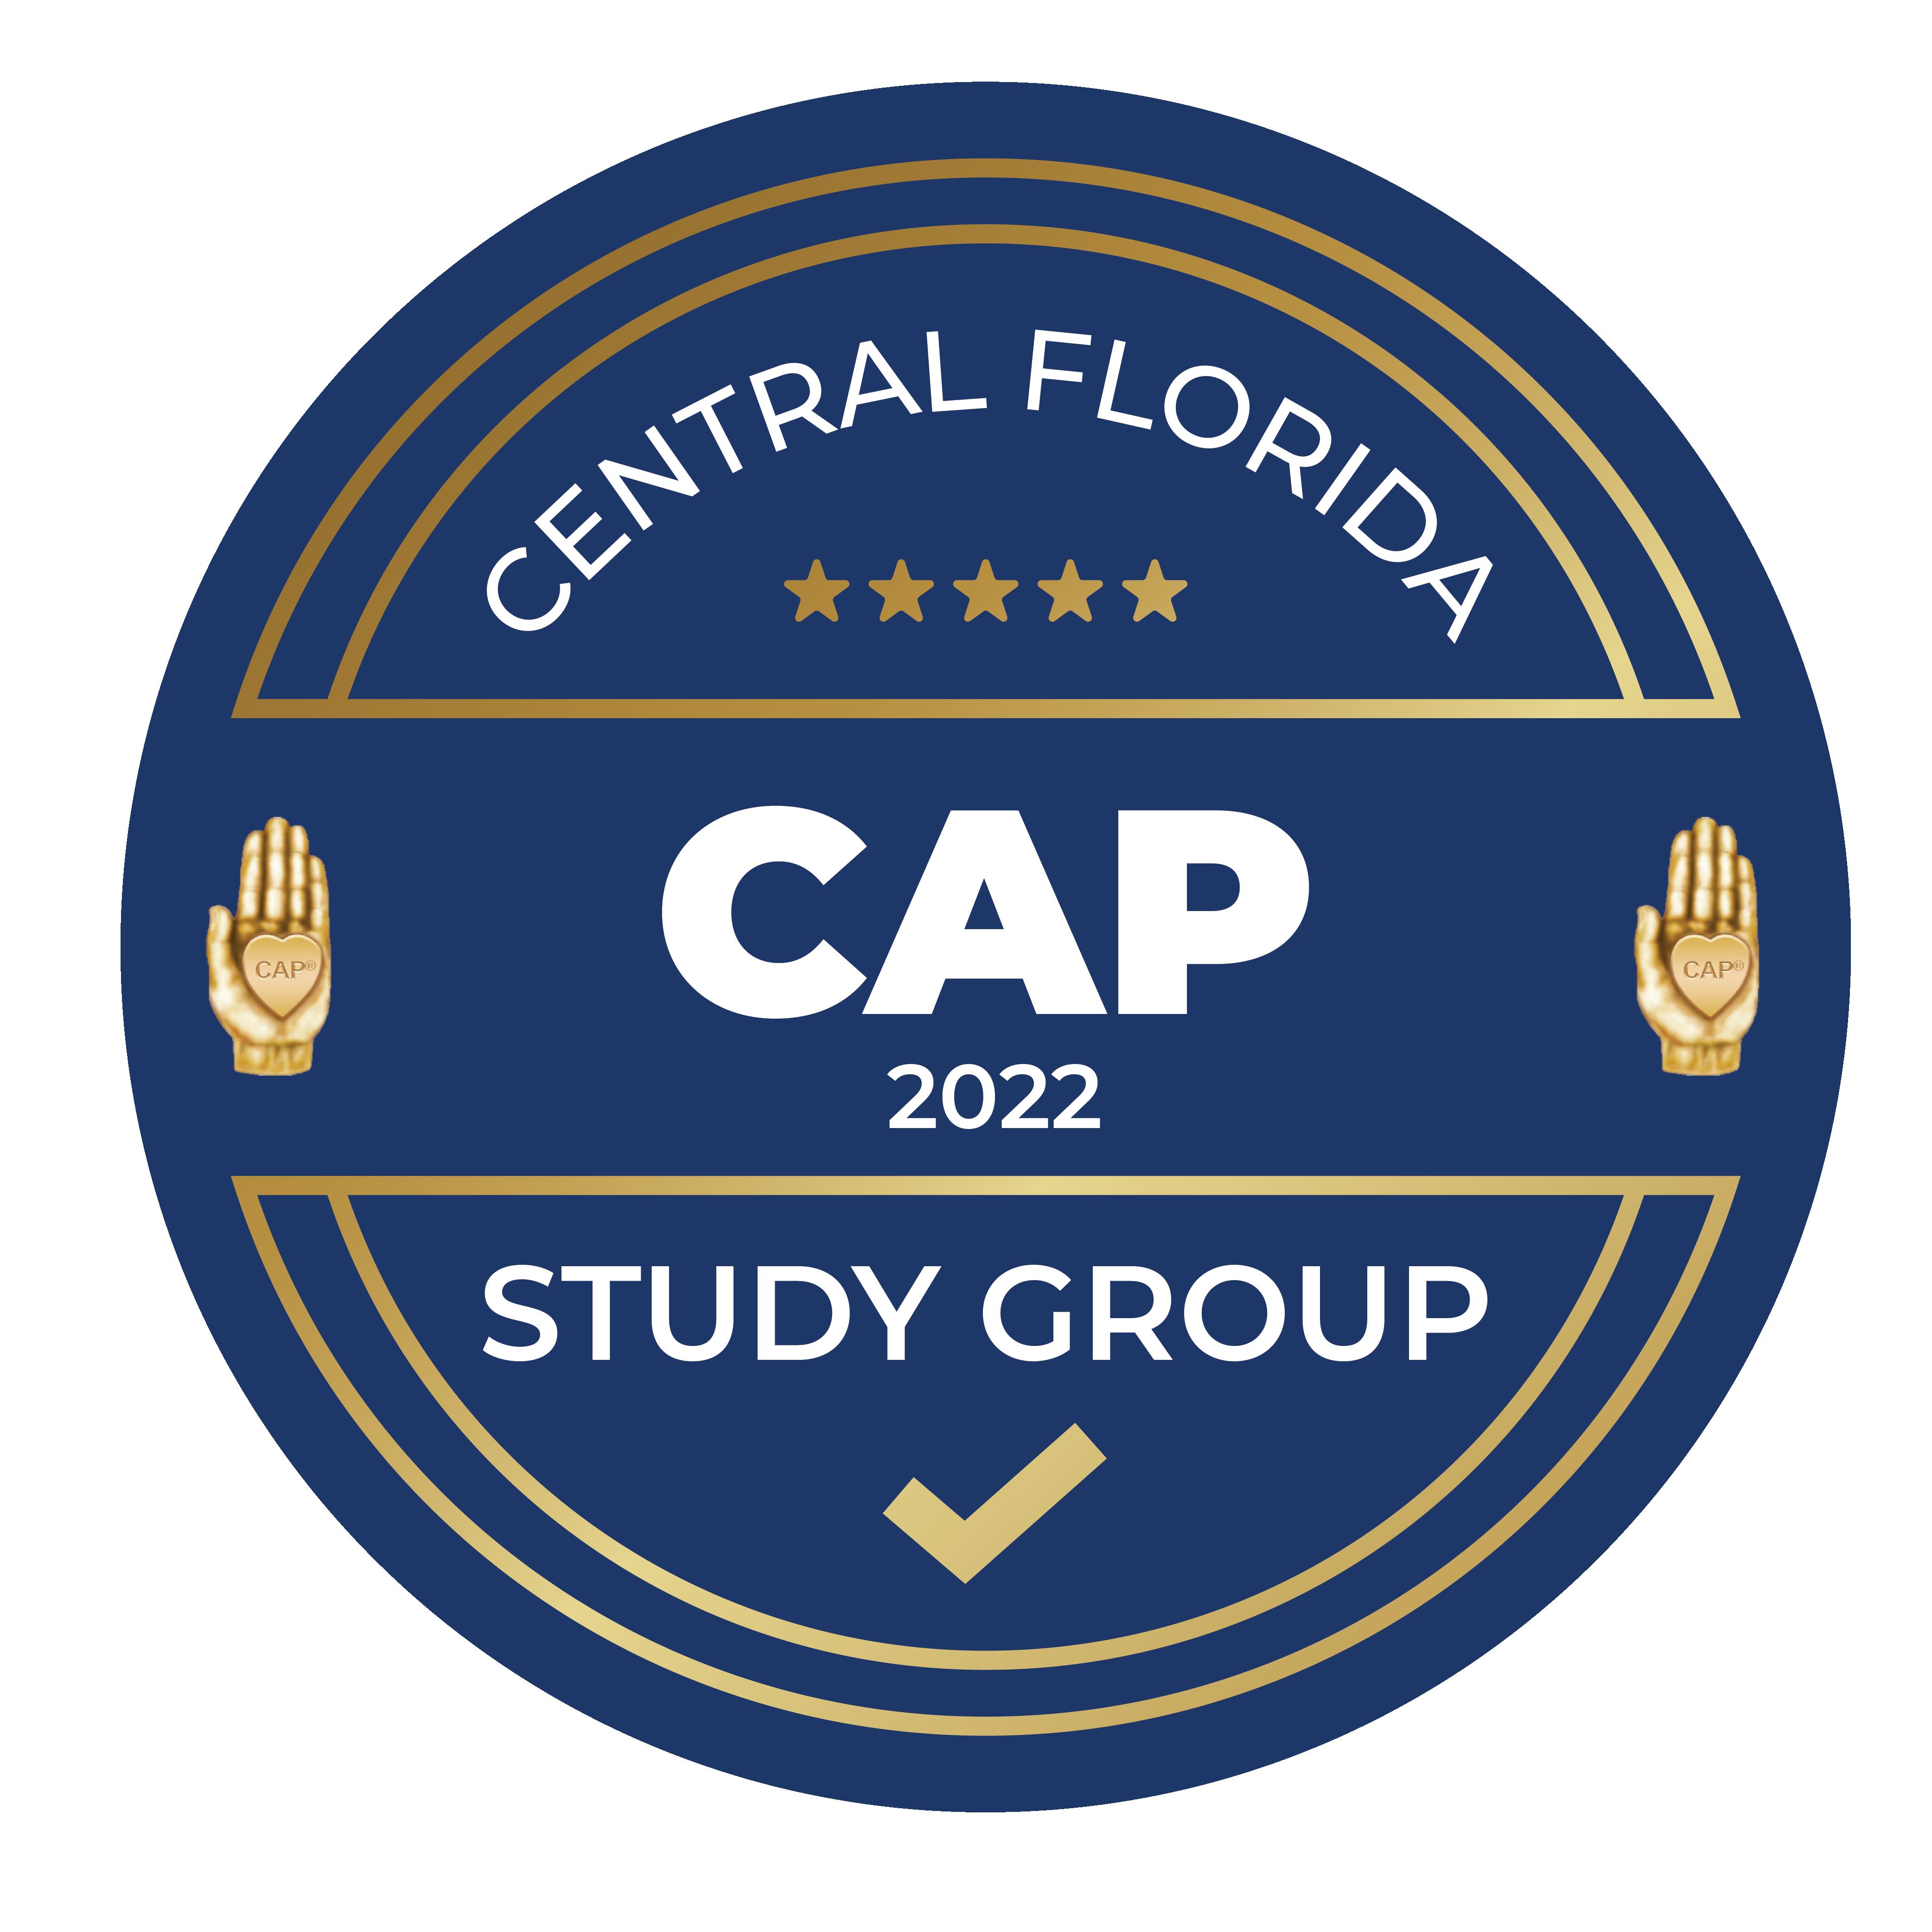 Central Florida Inaugural CAP Study Group